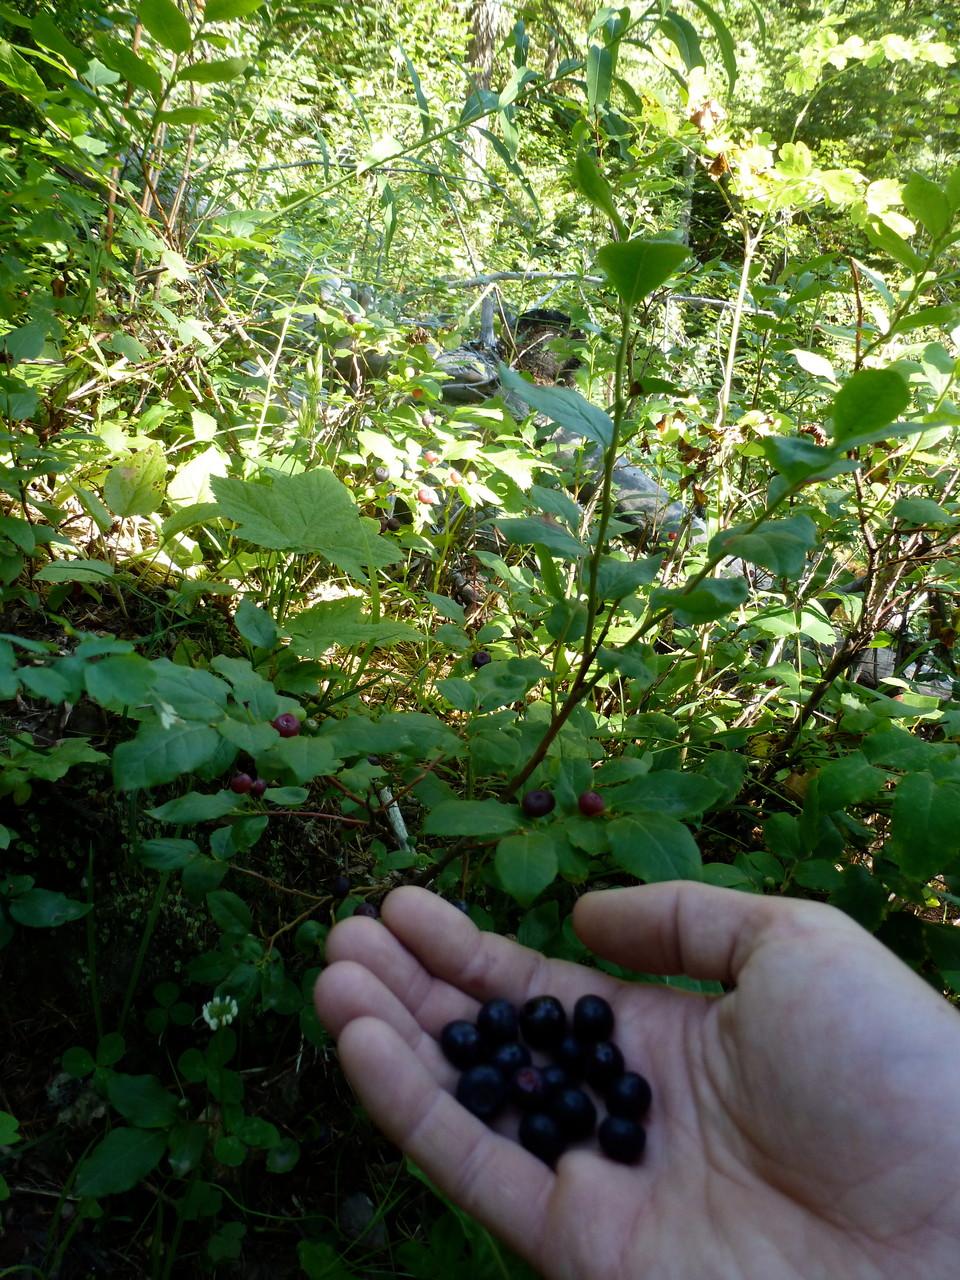 enjoying huckleberrys along the way